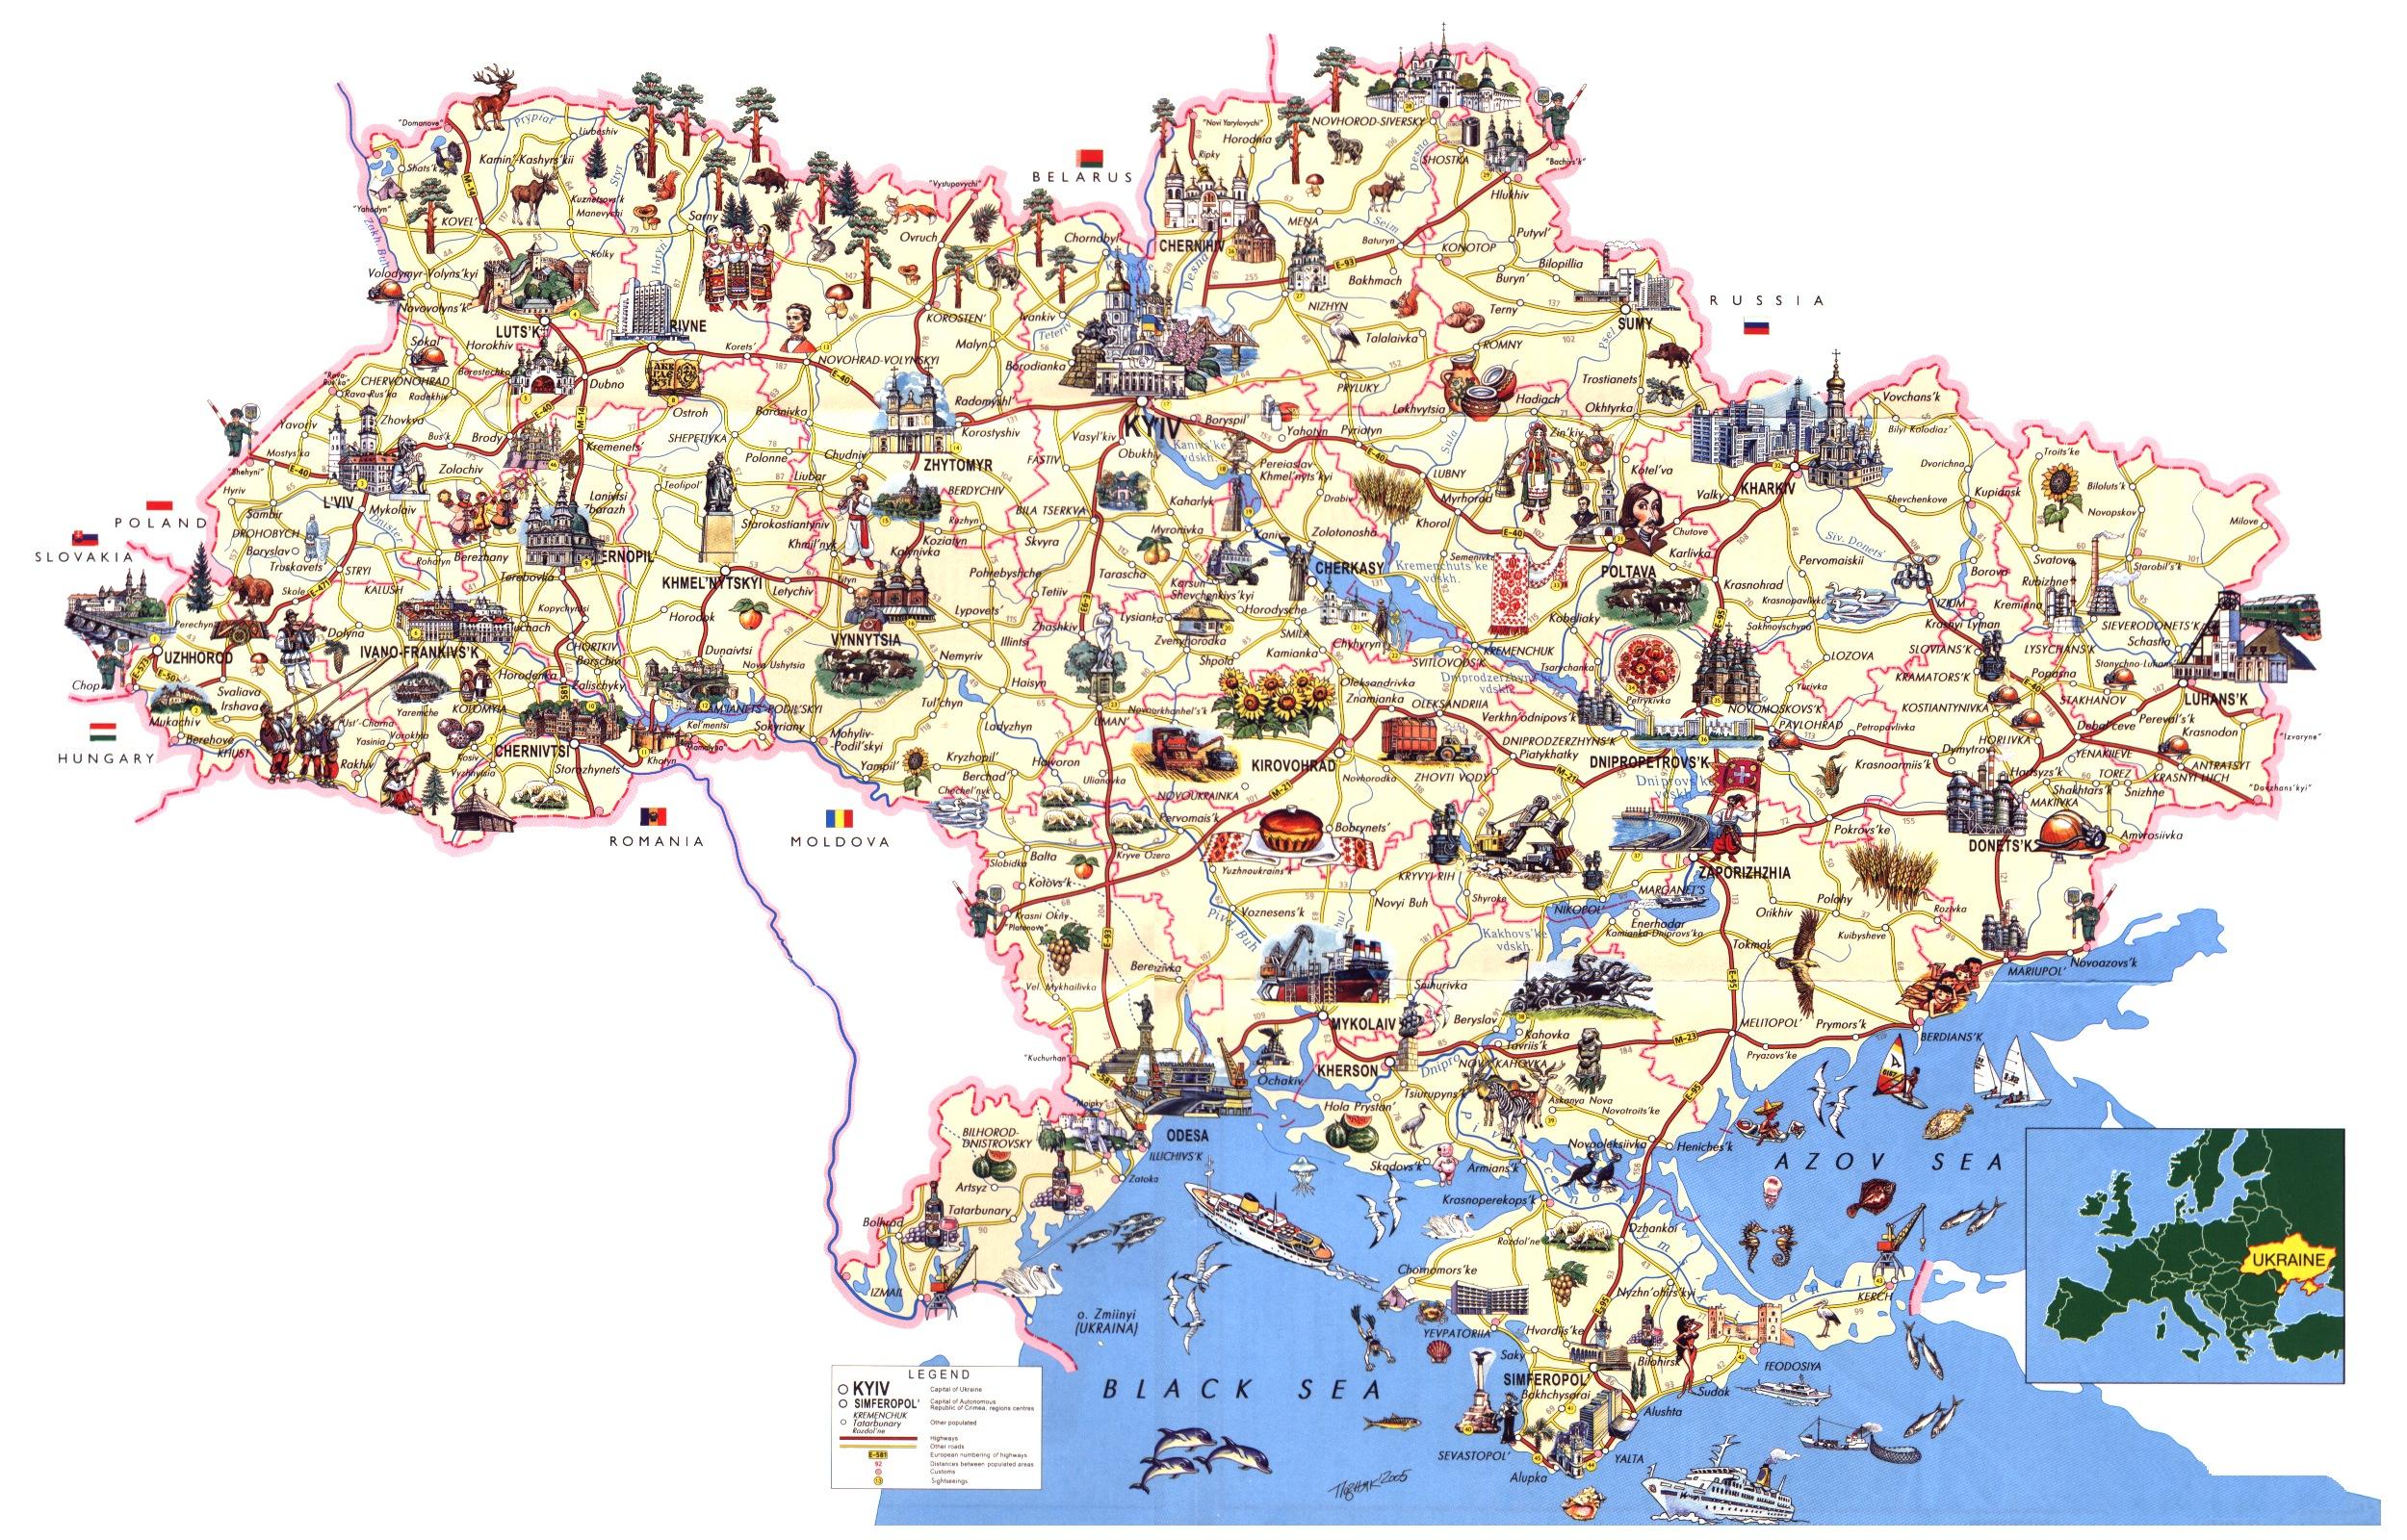 map glkfshtu Про нас